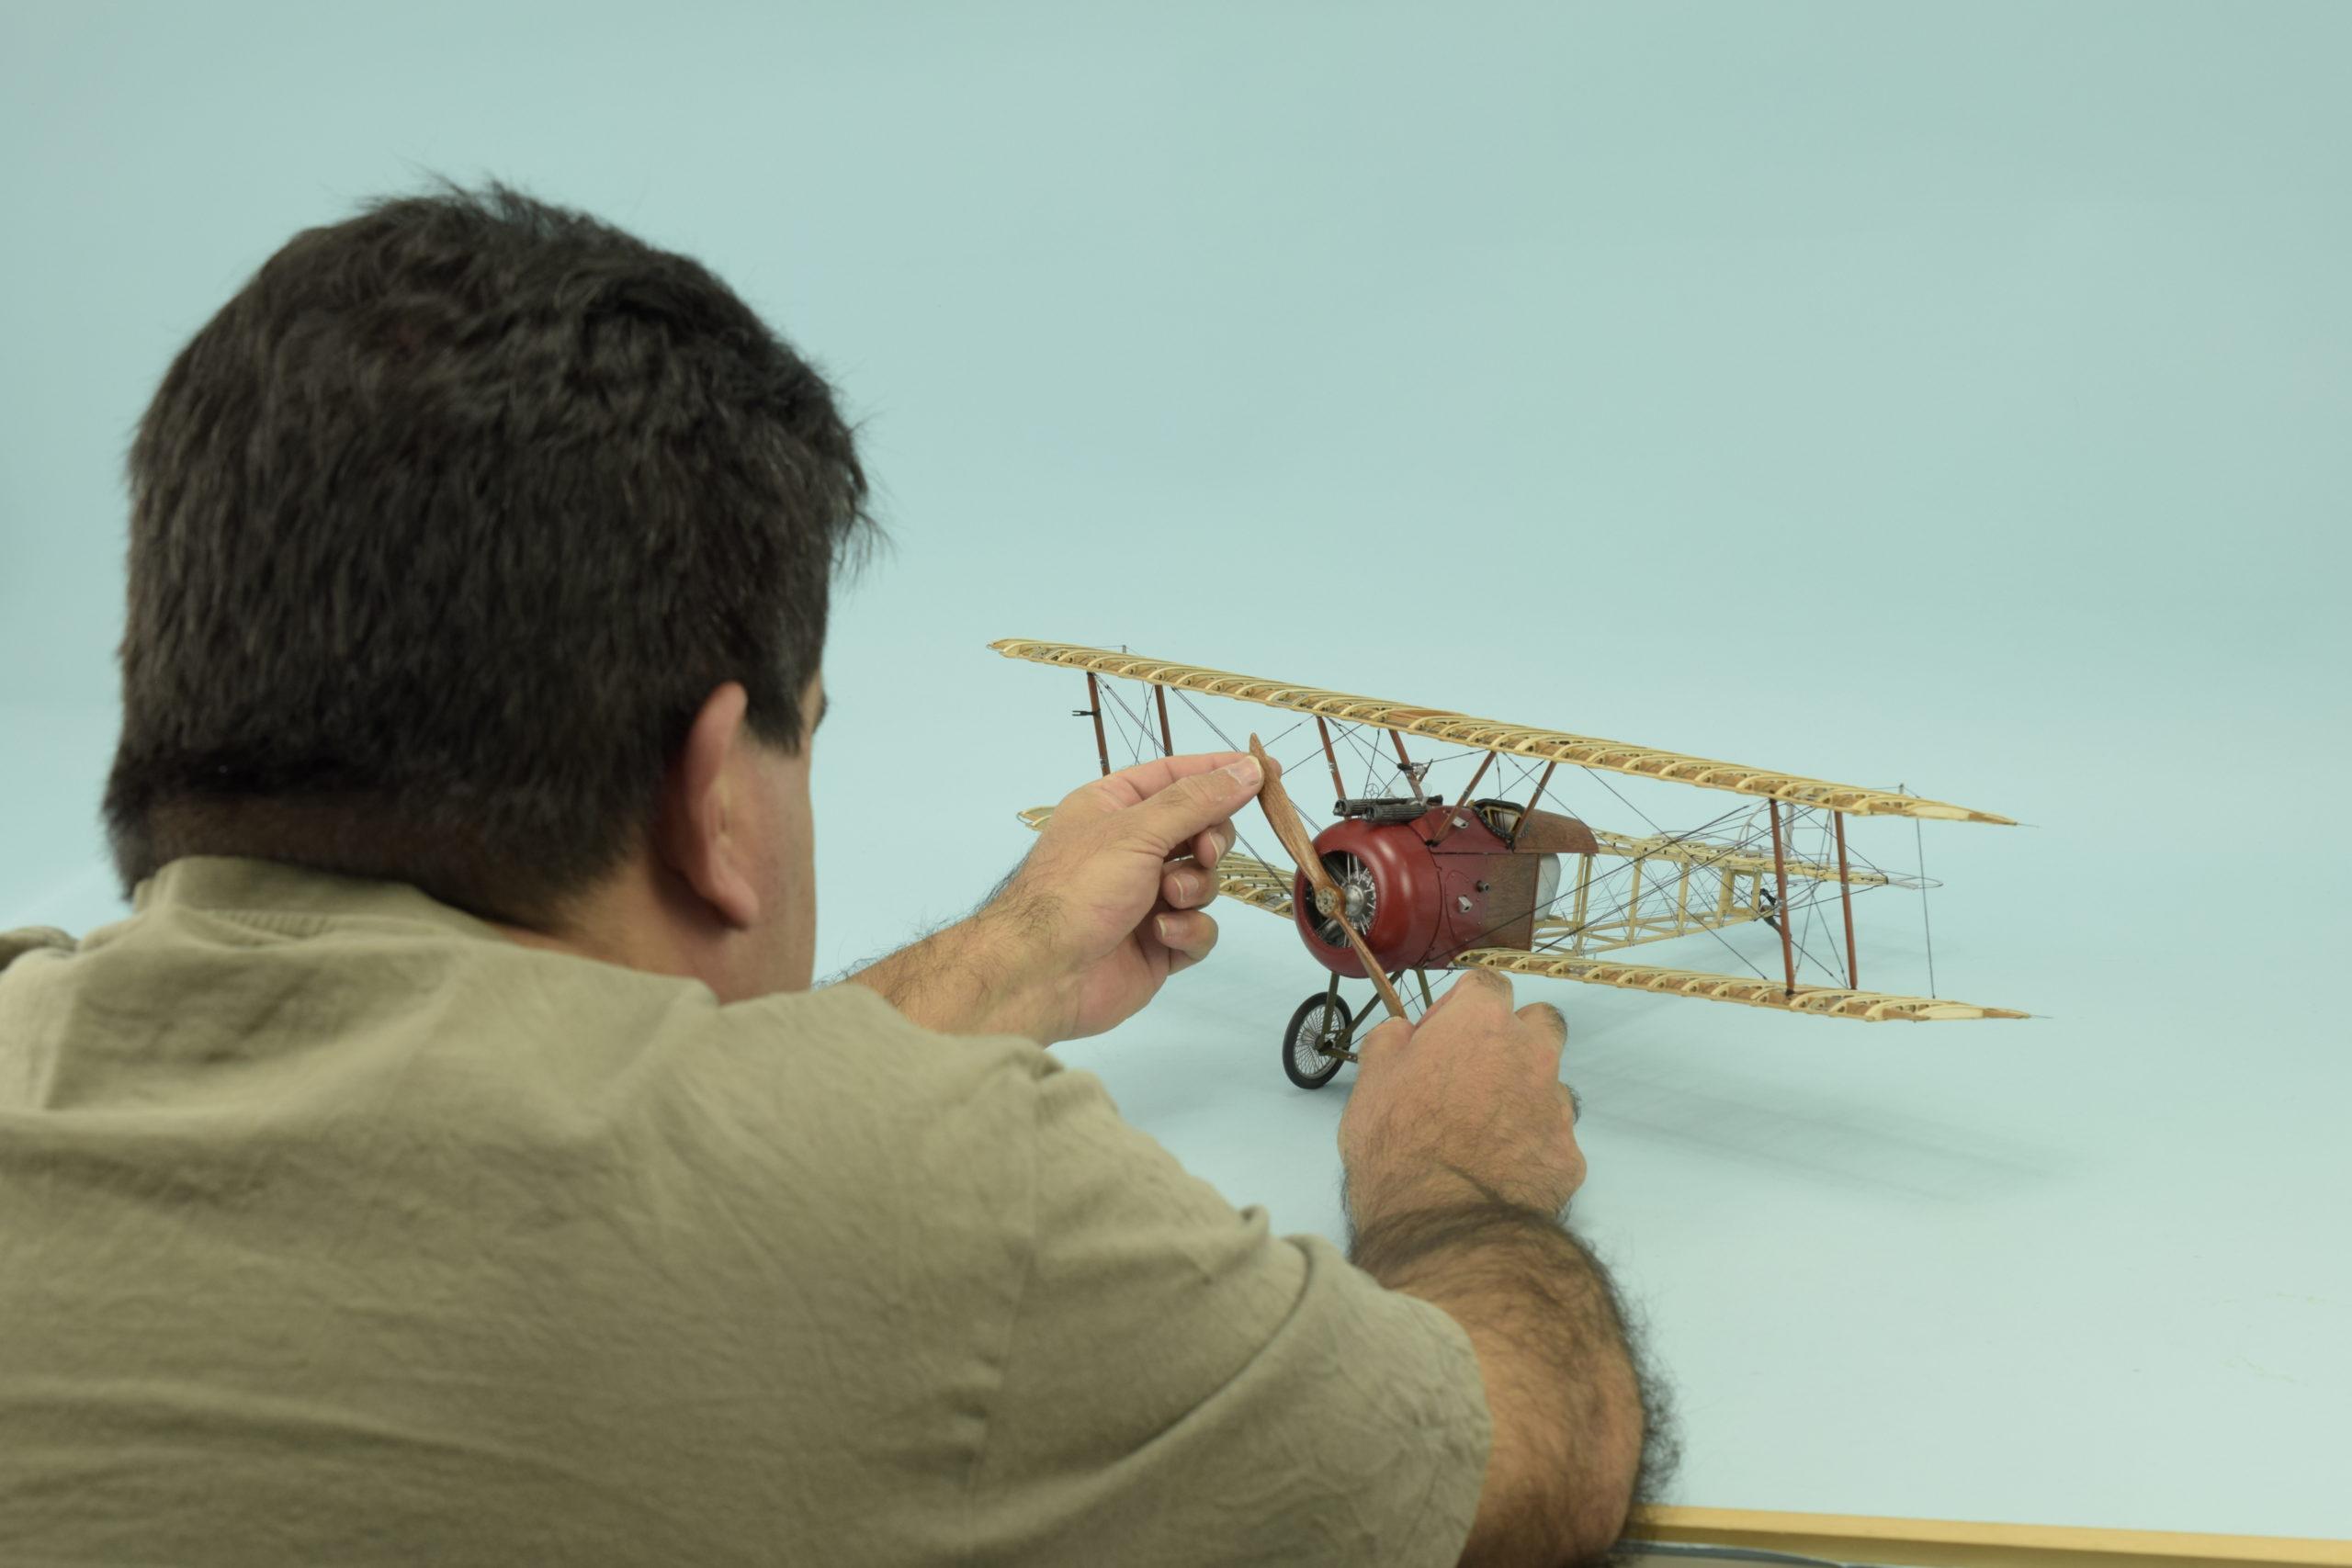 Aircraft Model Sopwith Camel 1/16.